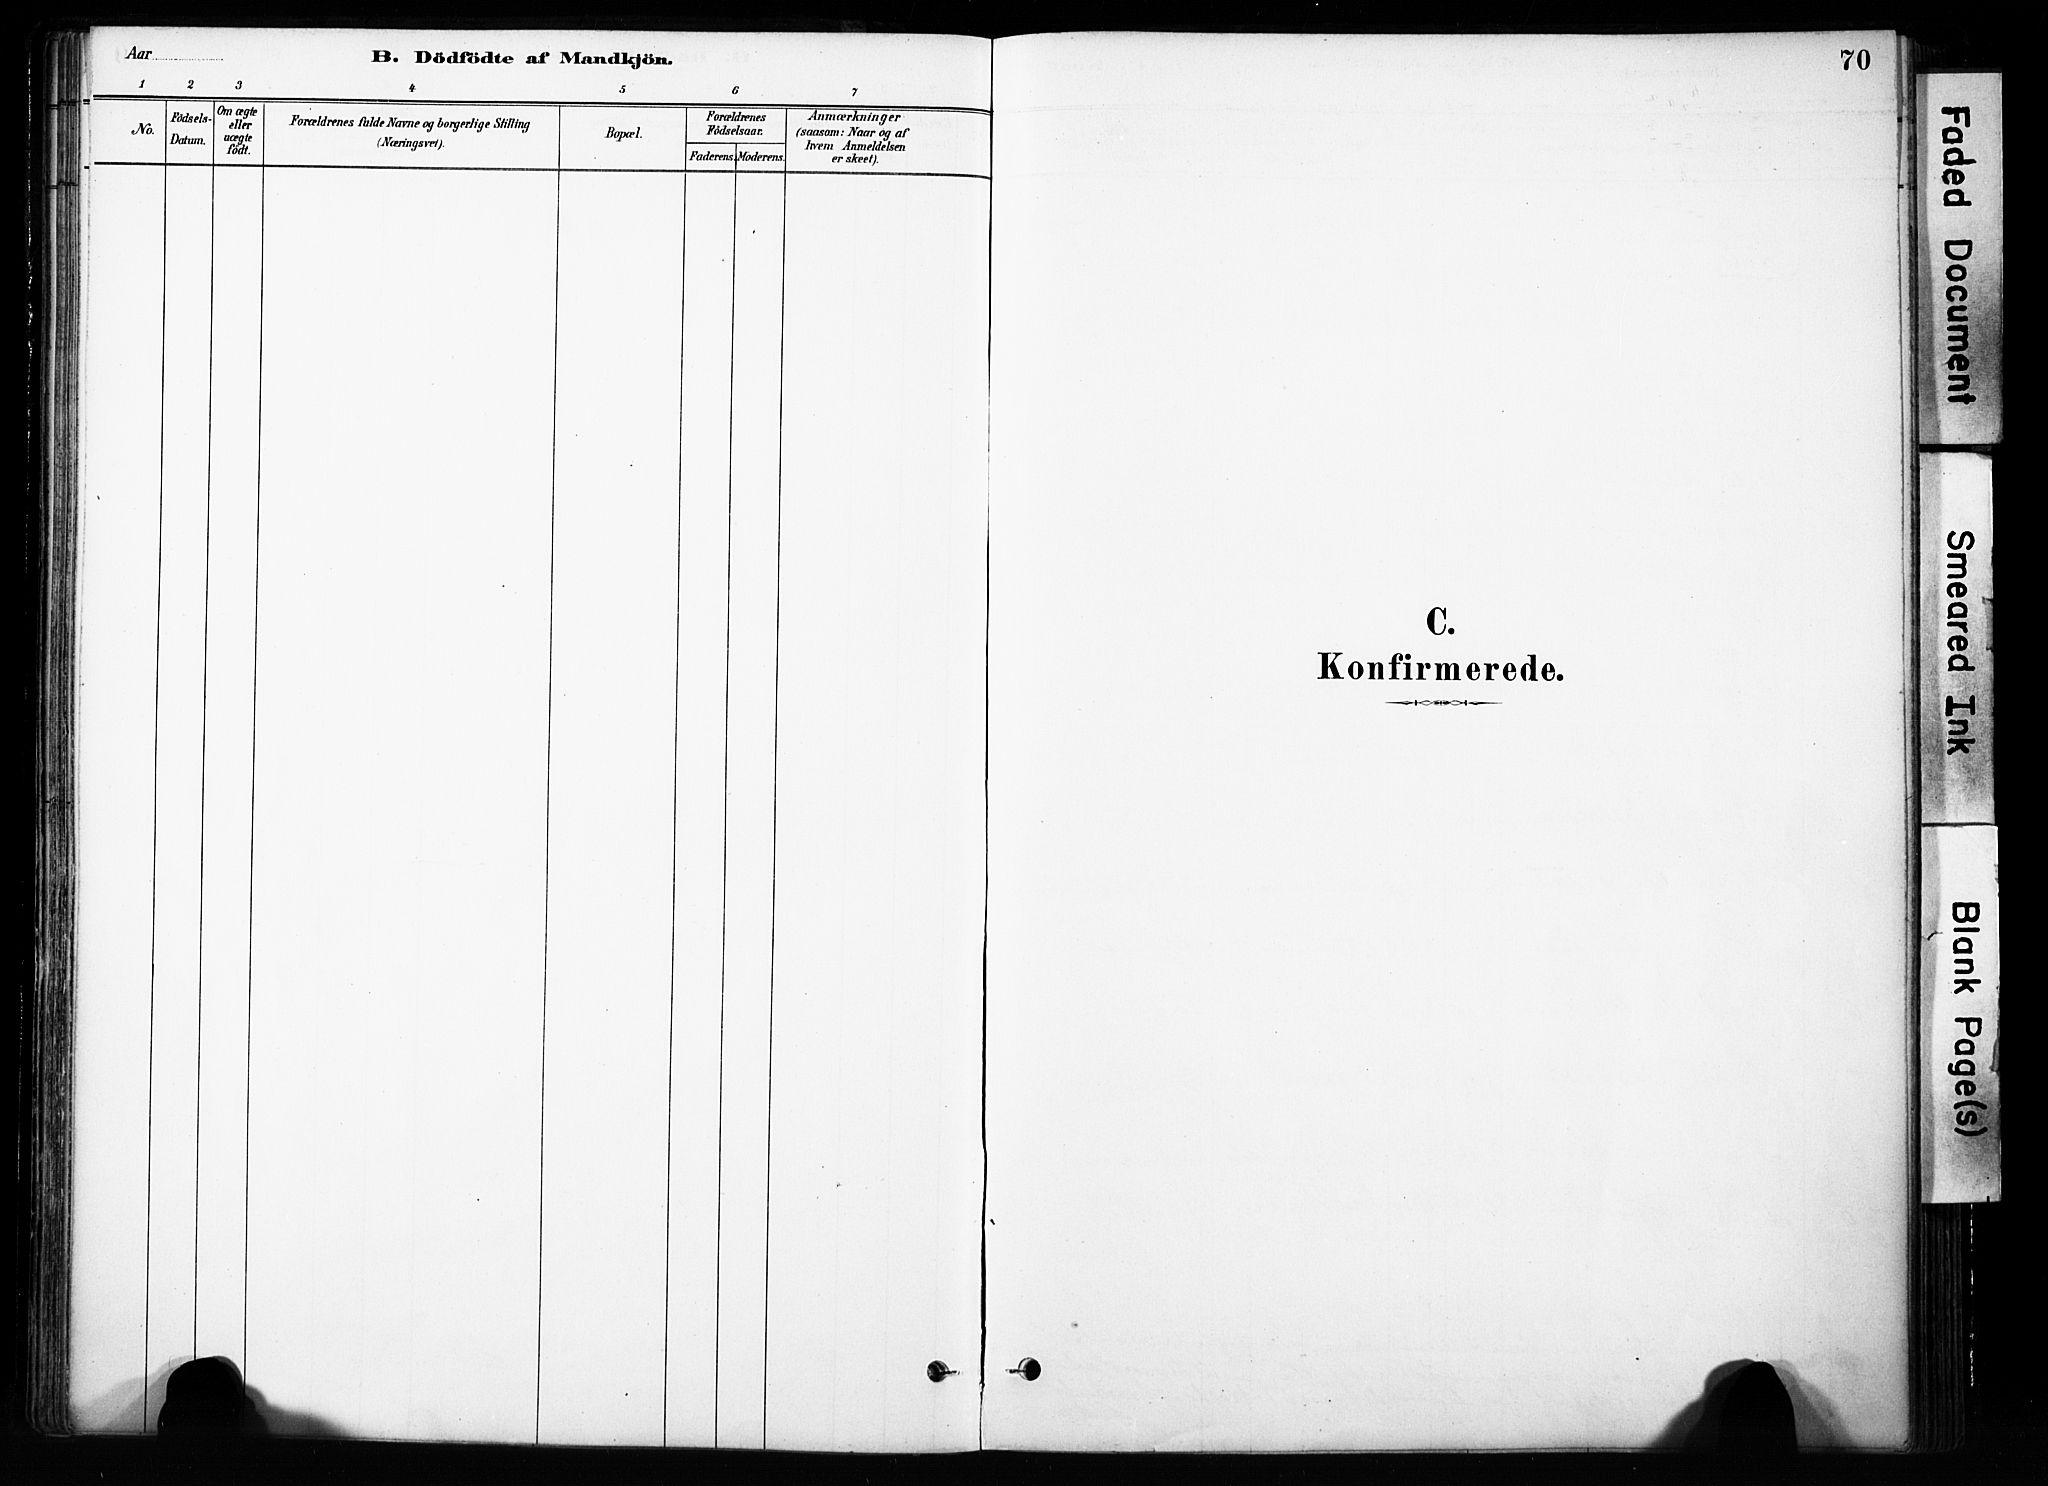 SAH, Skjåk prestekontor, Ministerialbok nr. 4, 1880-1904, s. 70